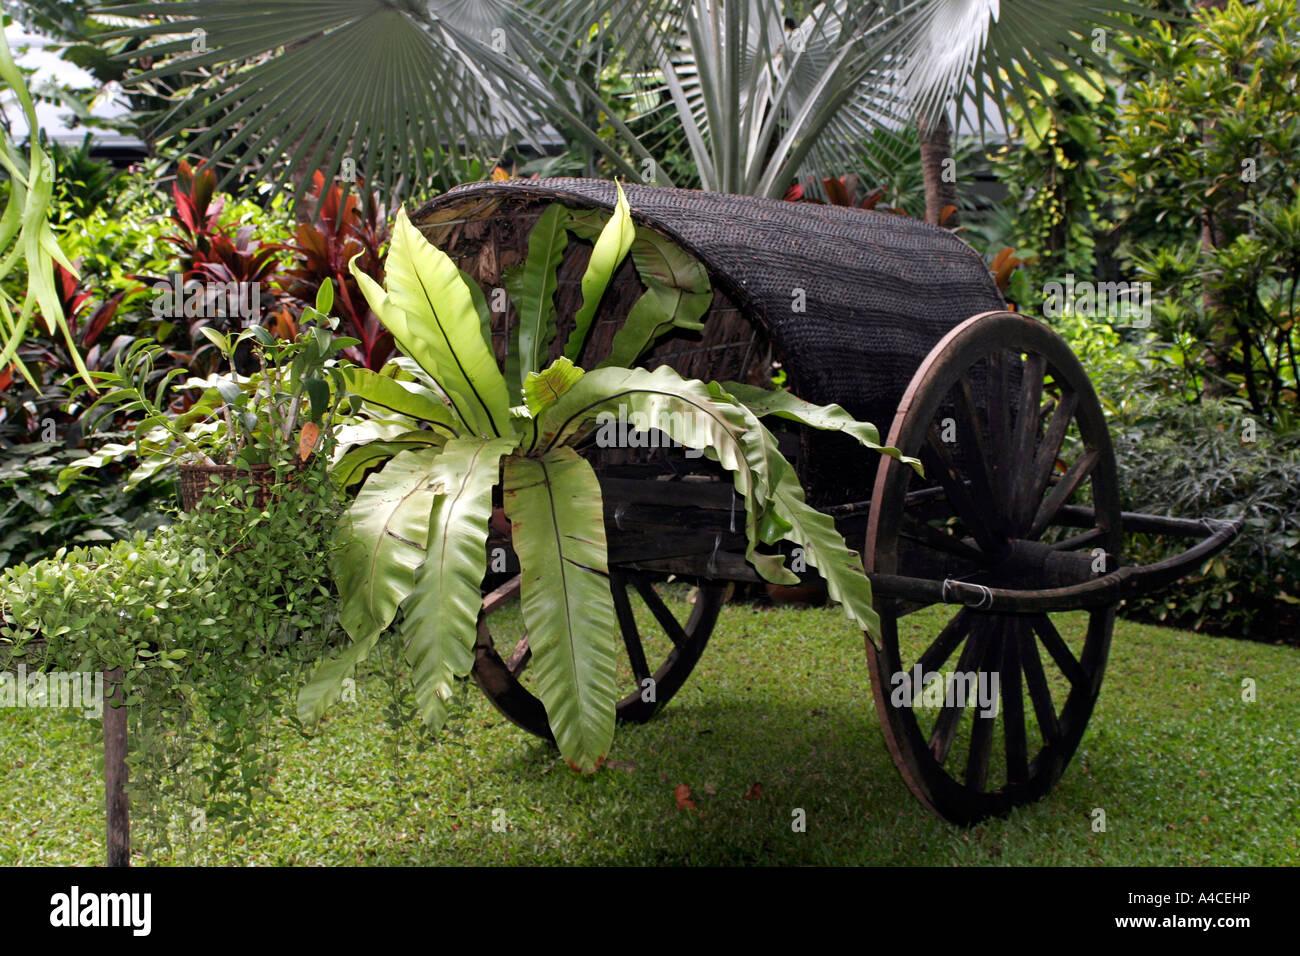 Decorative Sedan Chair In Thailand Garden Stock Photo, Royalty Free ...